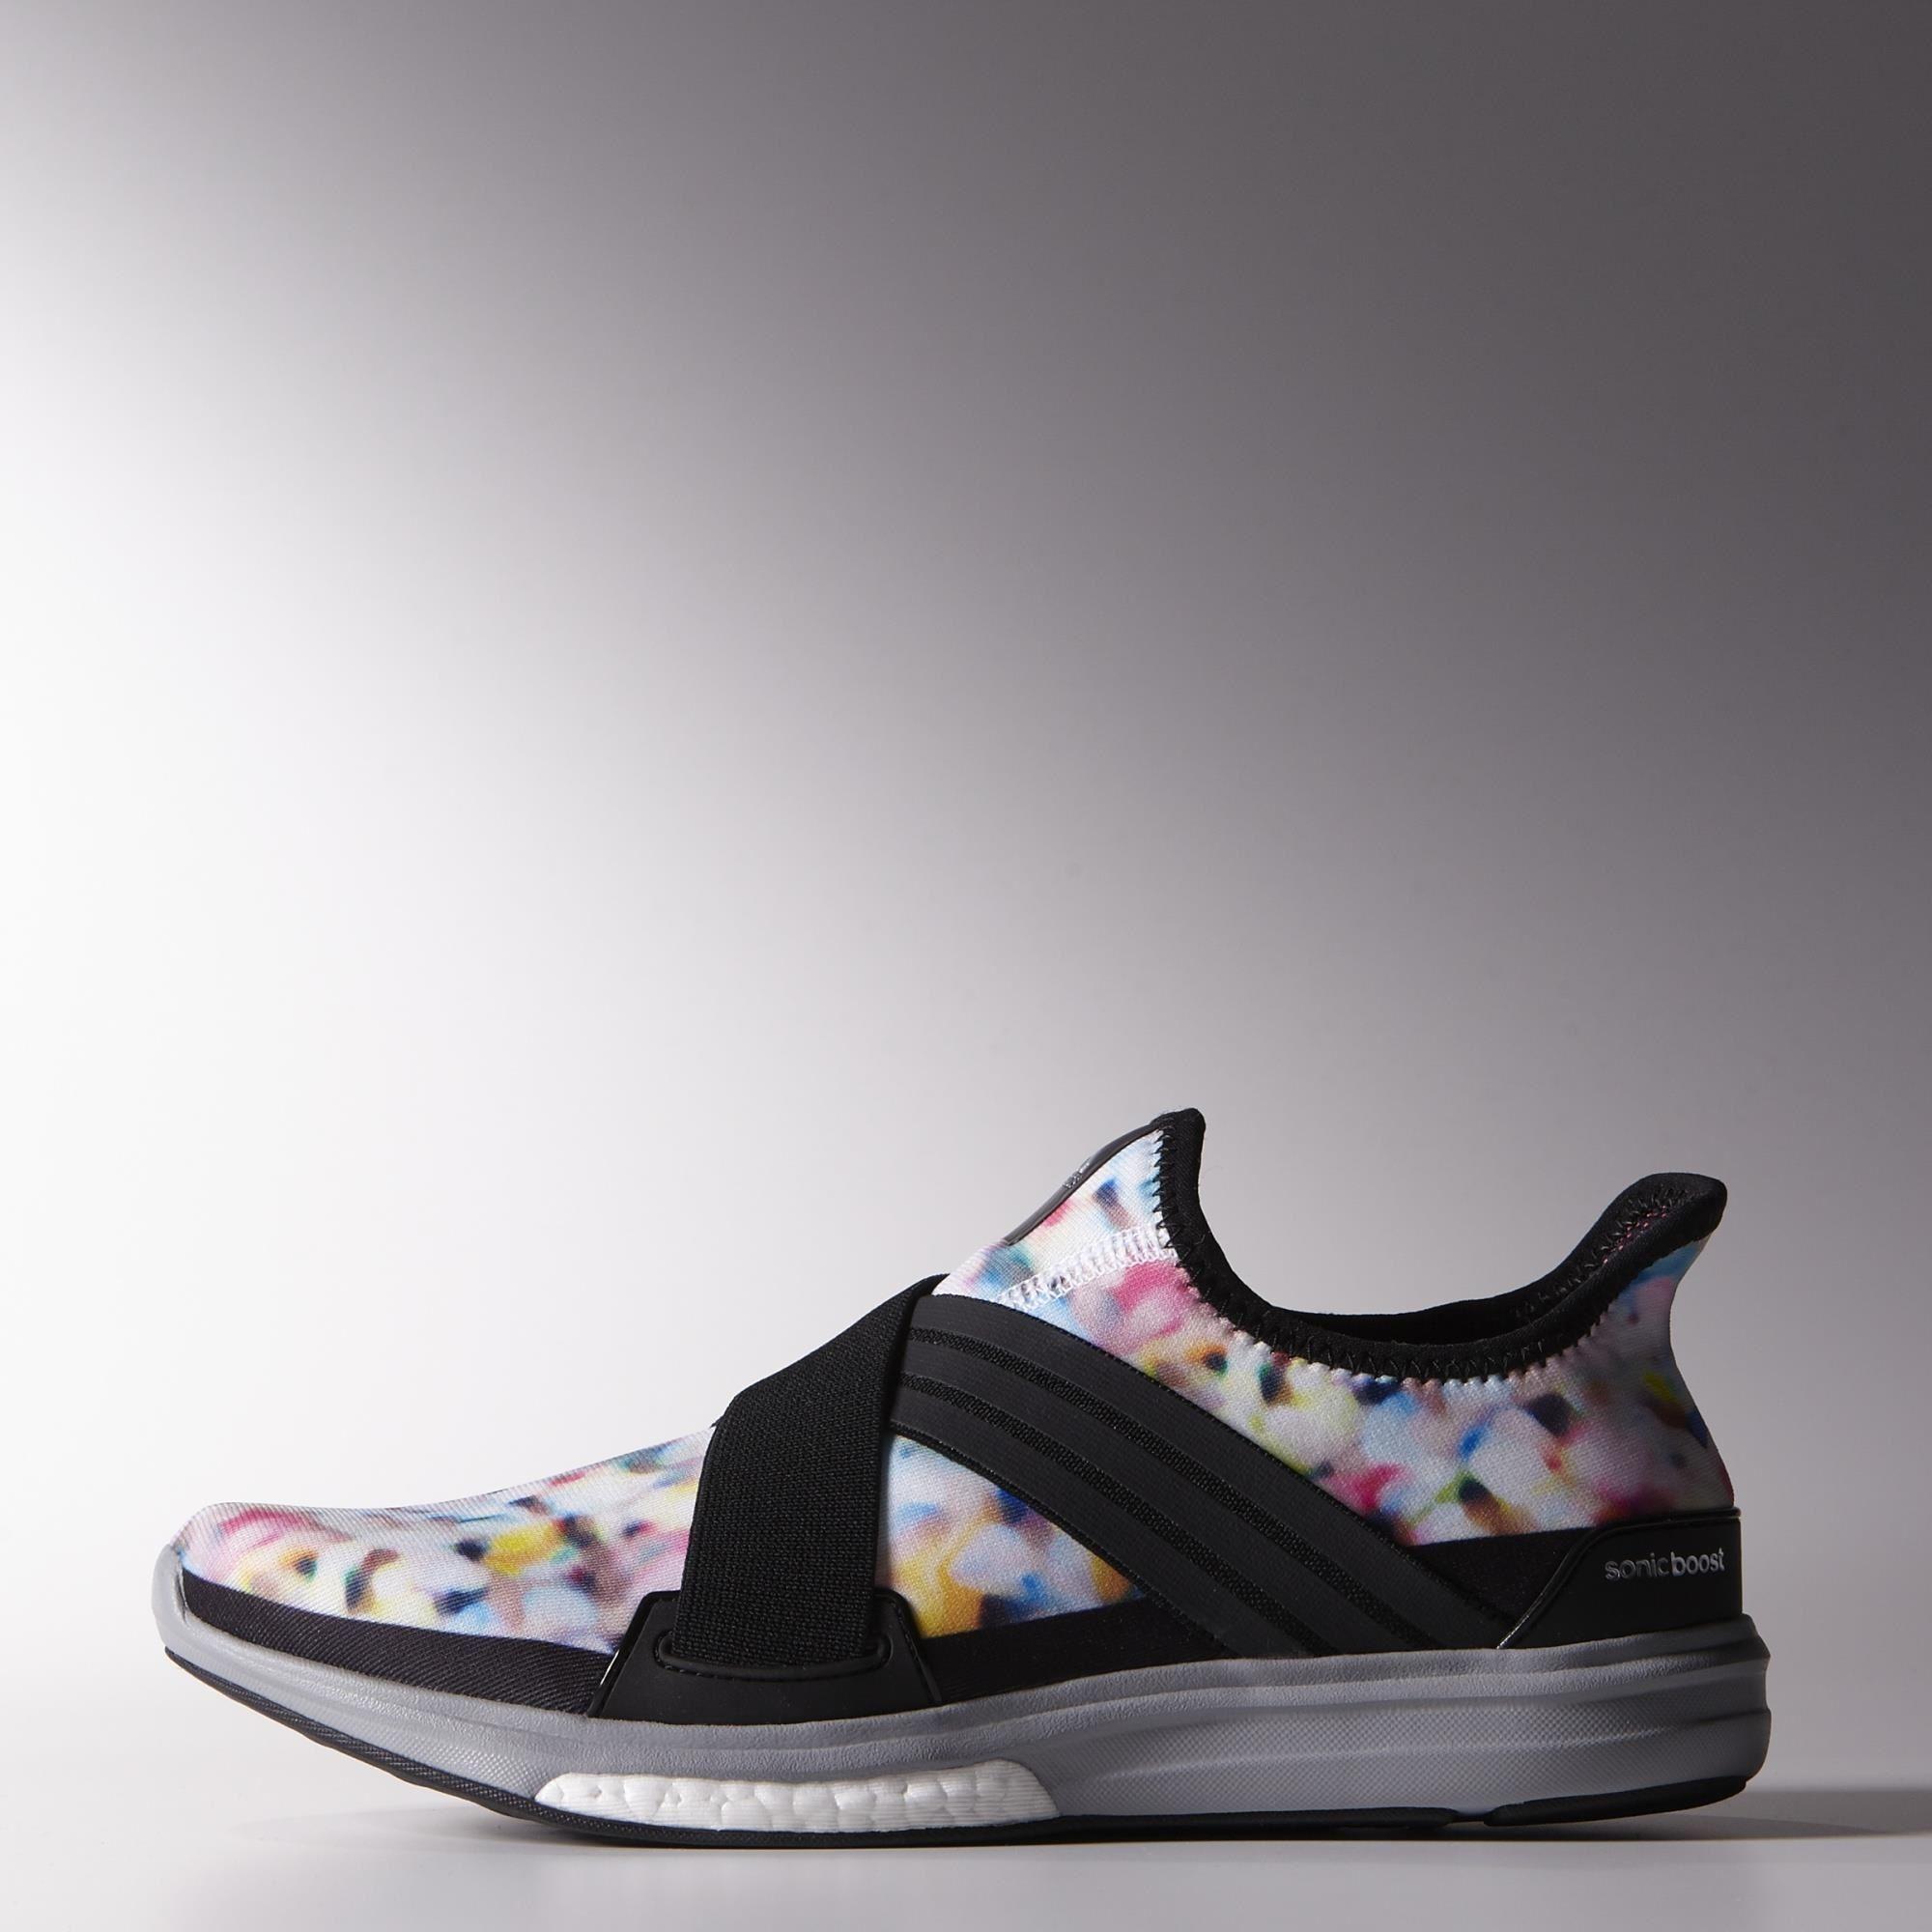 Adidas climachill sonic impulso scarpe adidas pinterest impulso